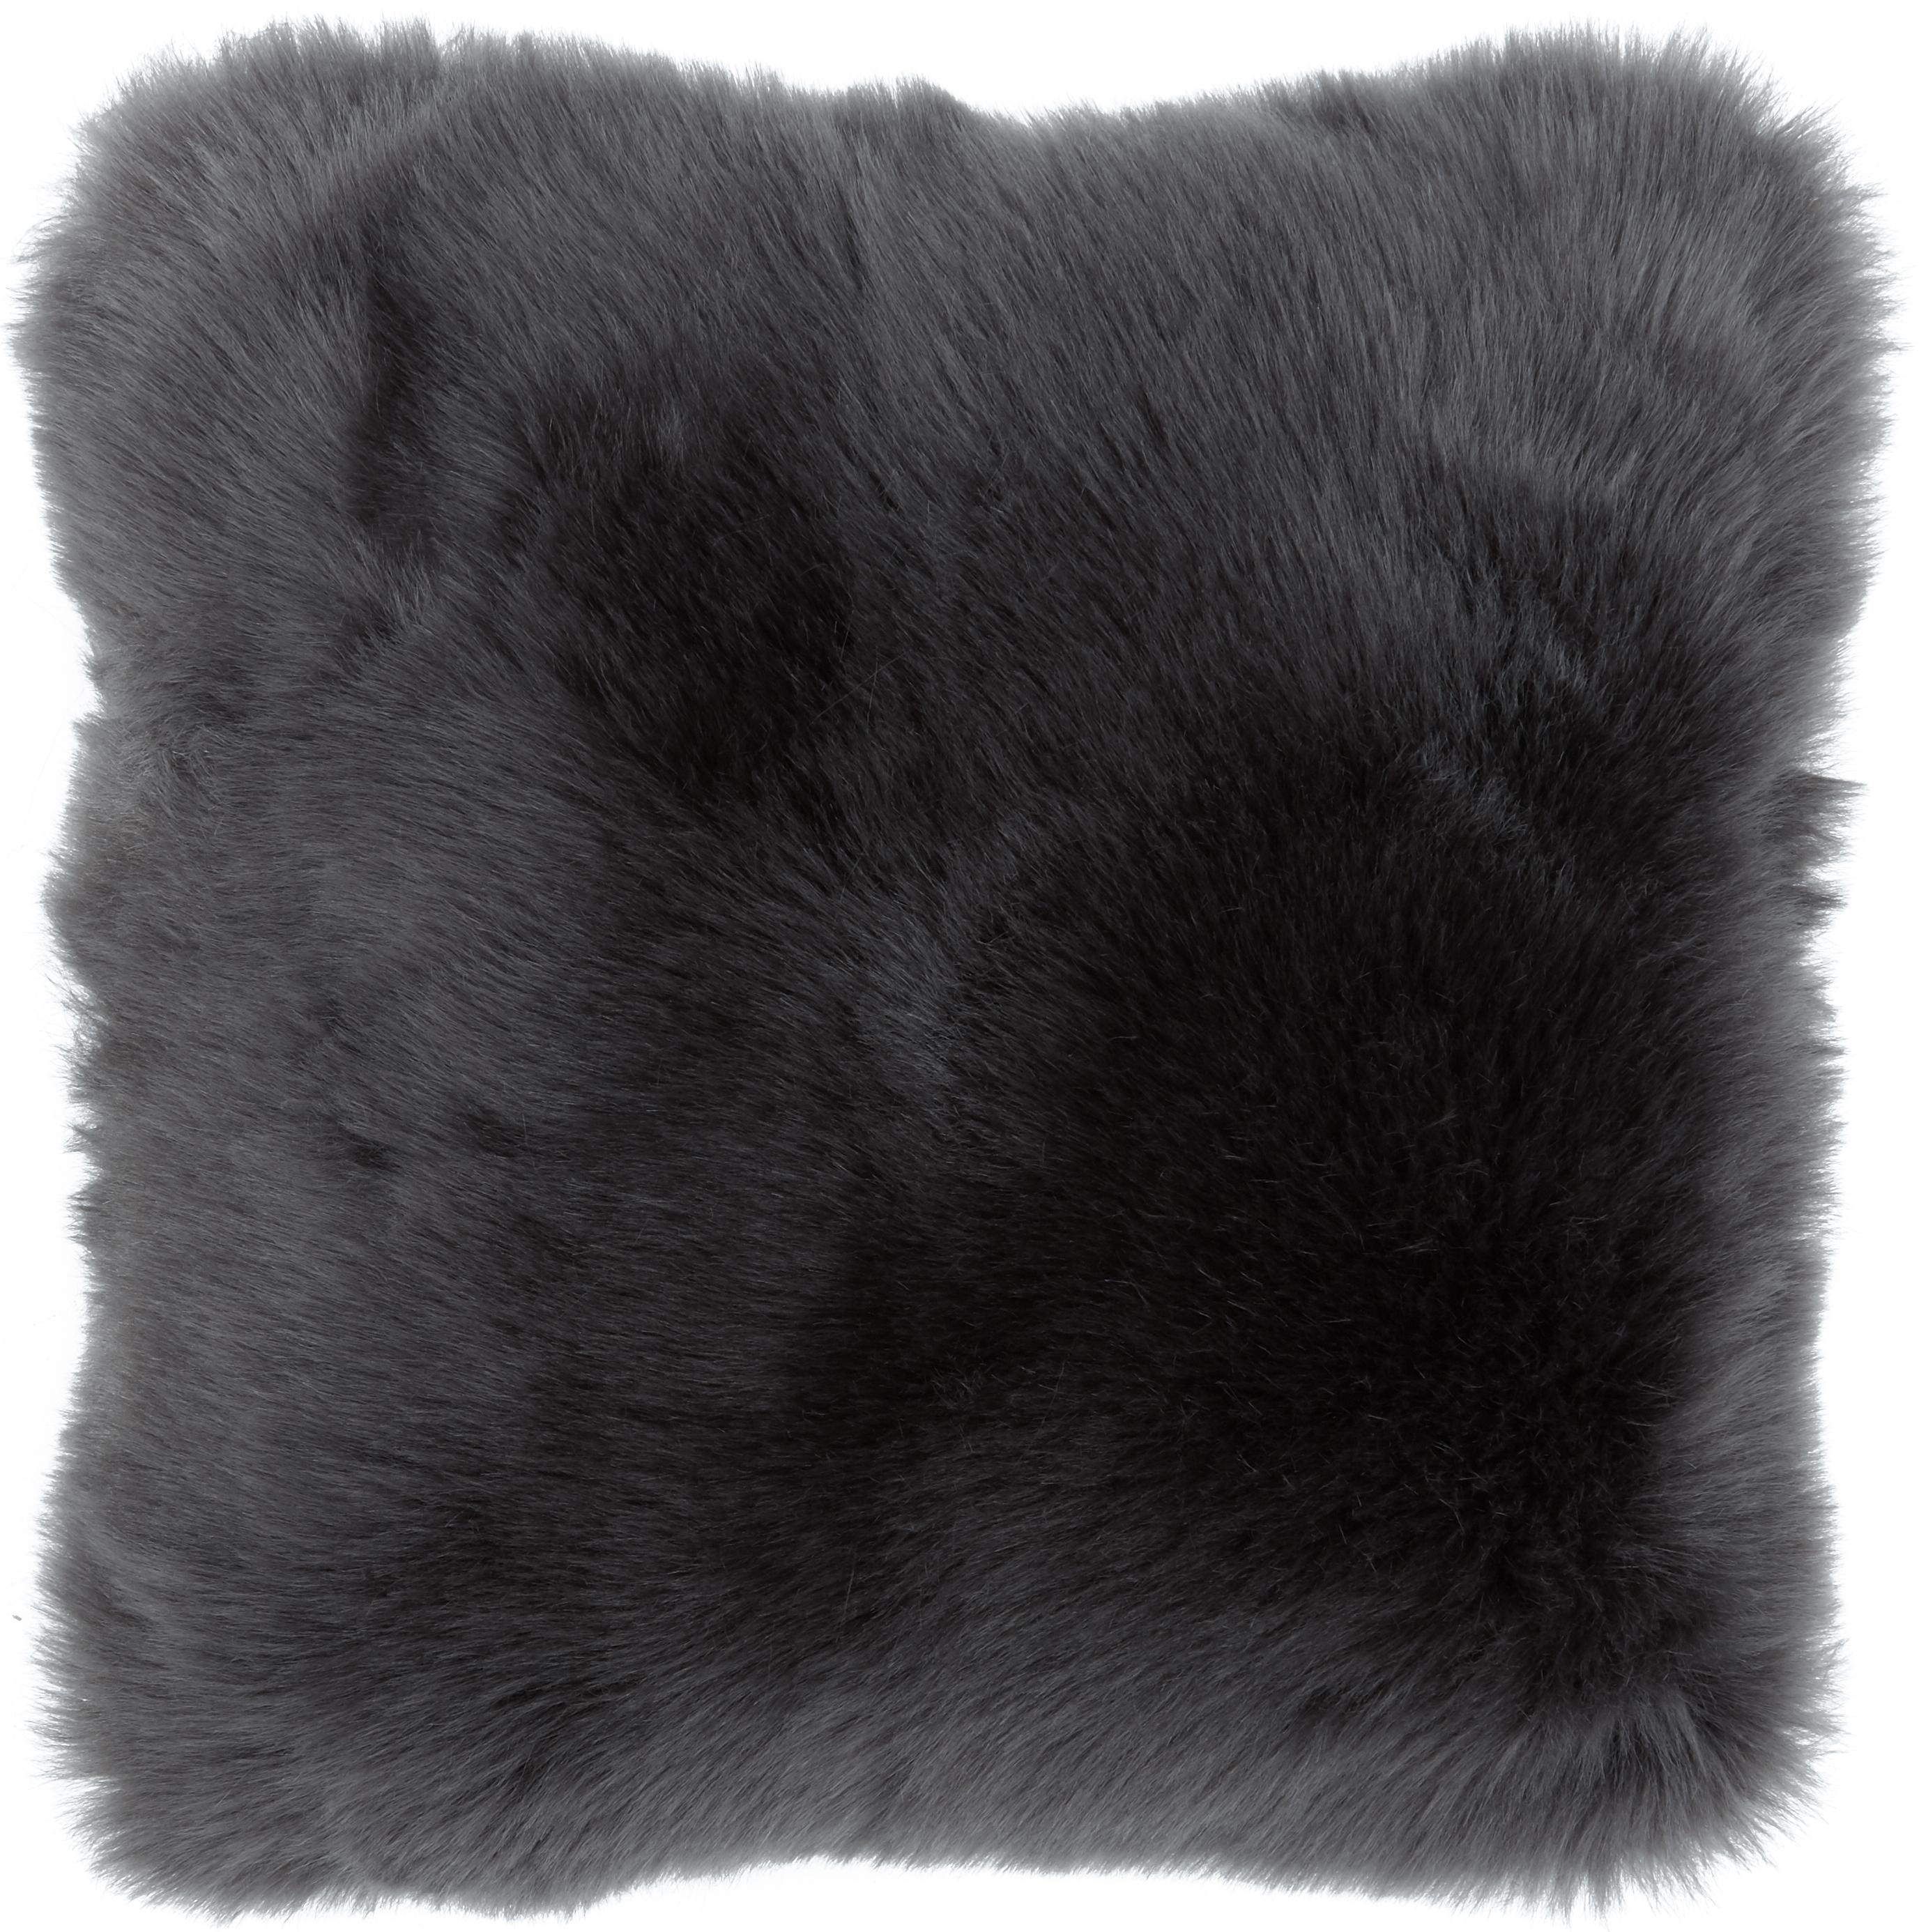 Flauschige Kunstfell-Kissenhülle Morten, gelockt, Vorderseite: 67% Acryl, 33% Polyester, Rückseite: 100% Polyester, Dunkelgrau, 40 x 40 cm